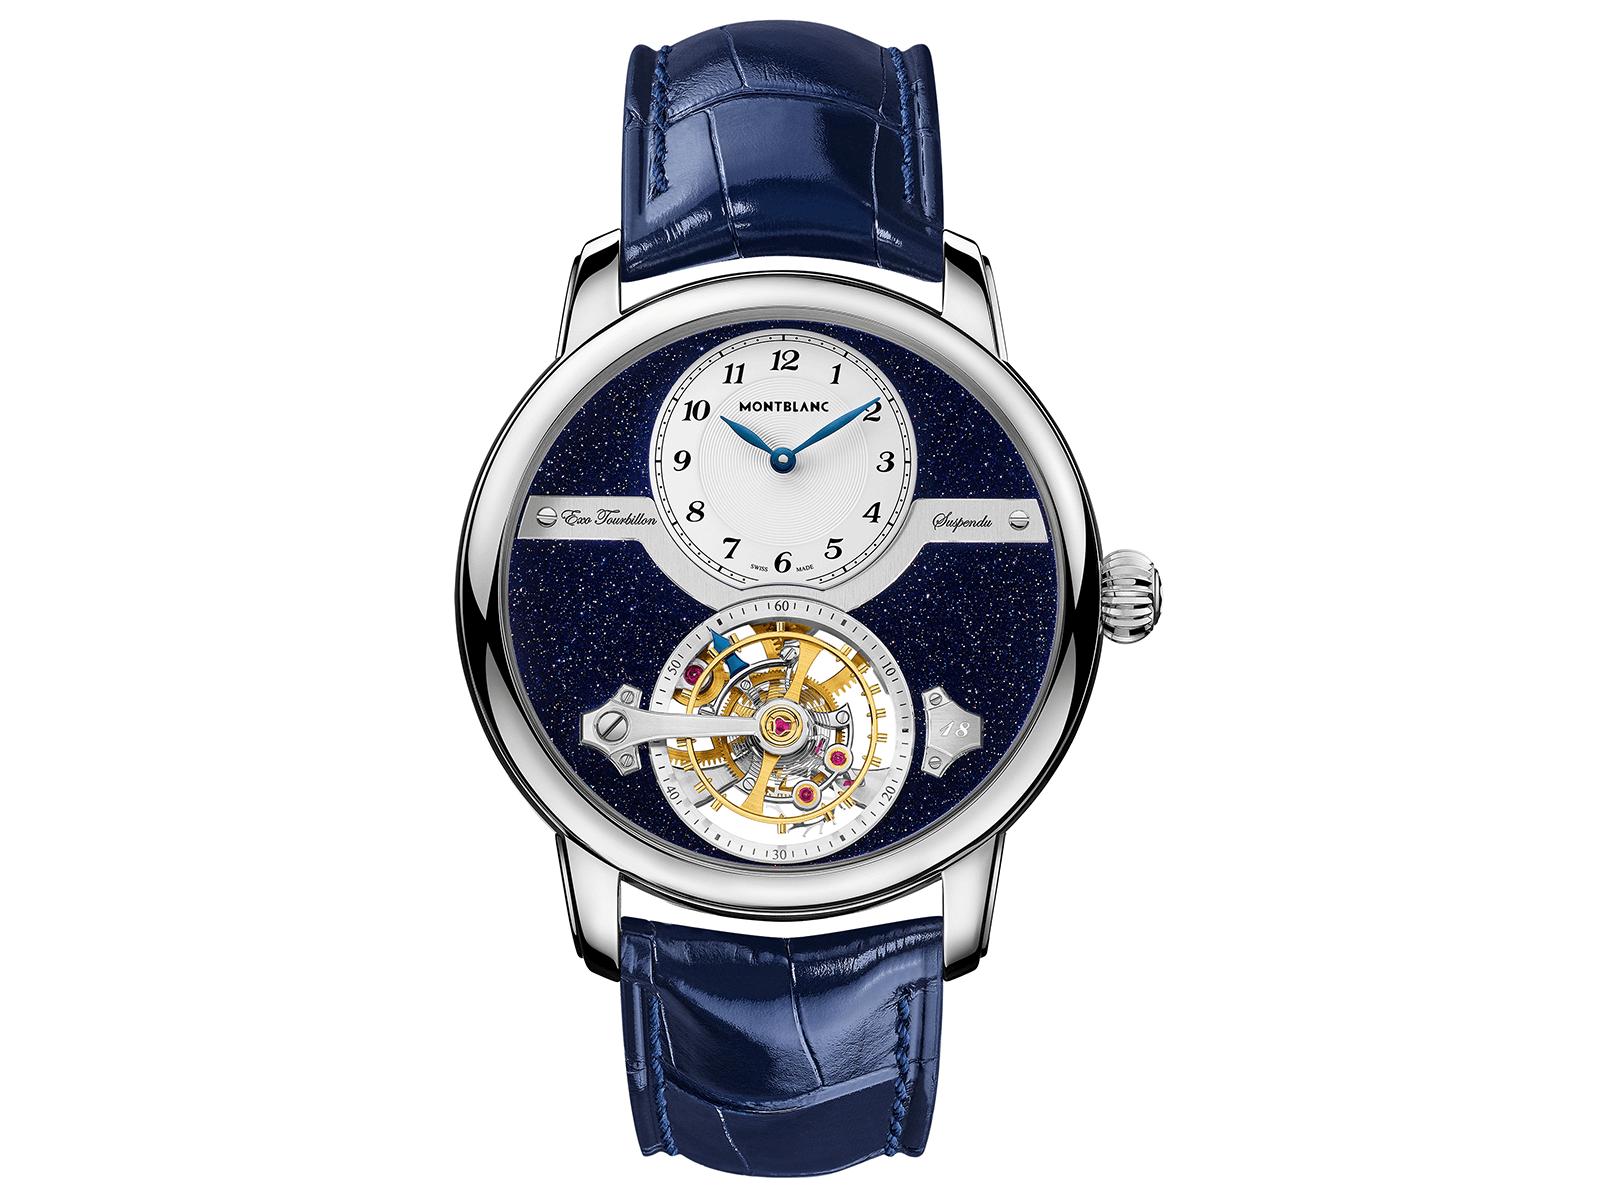 đồng hồ tourbillon montblanc star legacy suspended exo